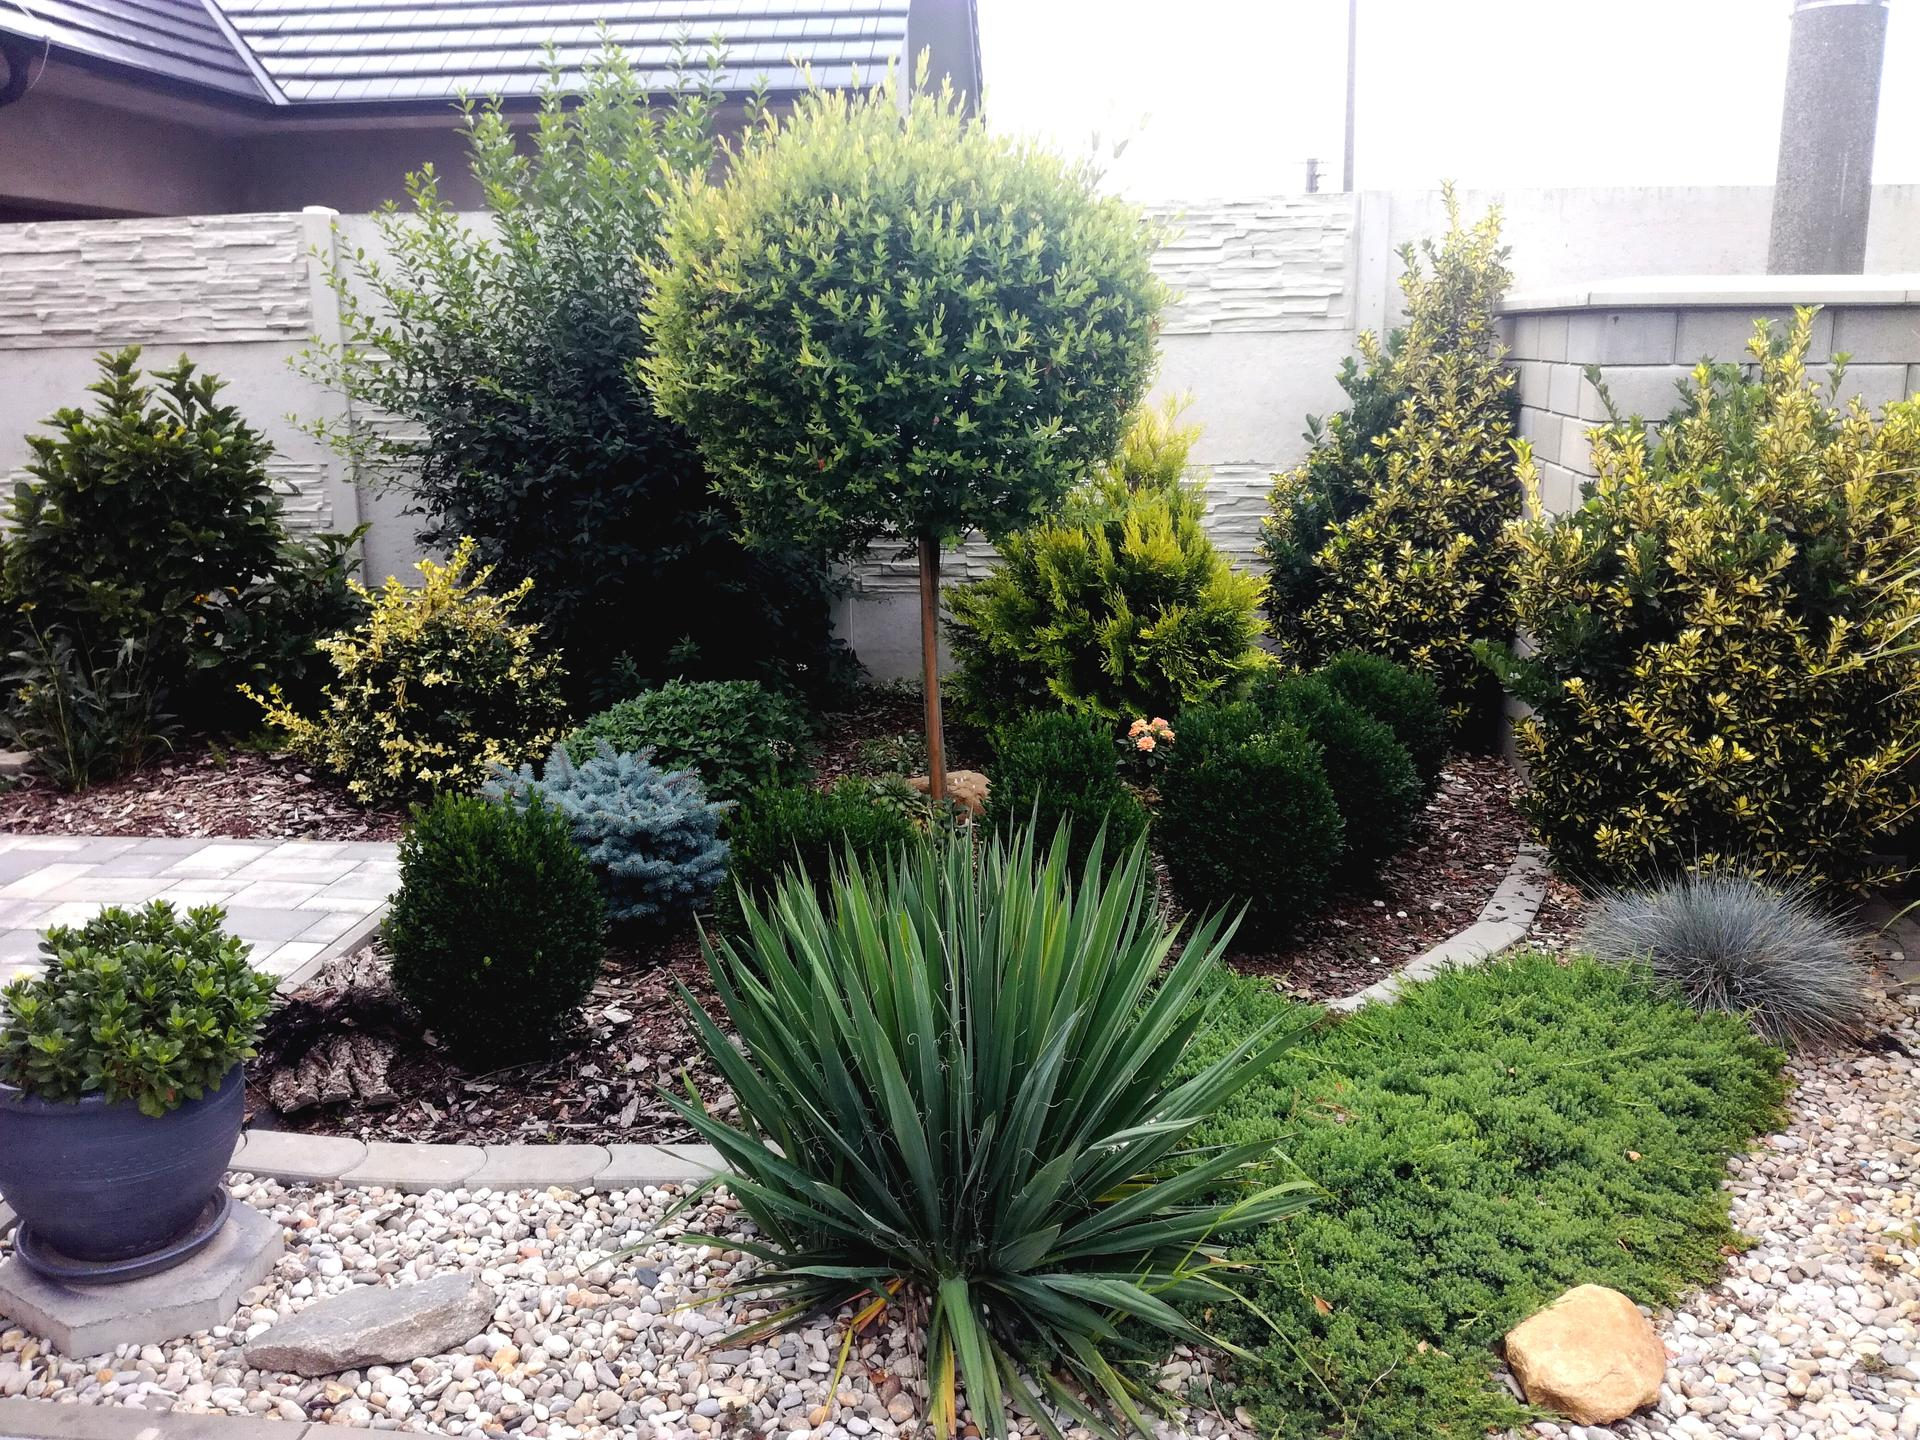 Zahrada 2021 🌲 - Obrázek č. 195